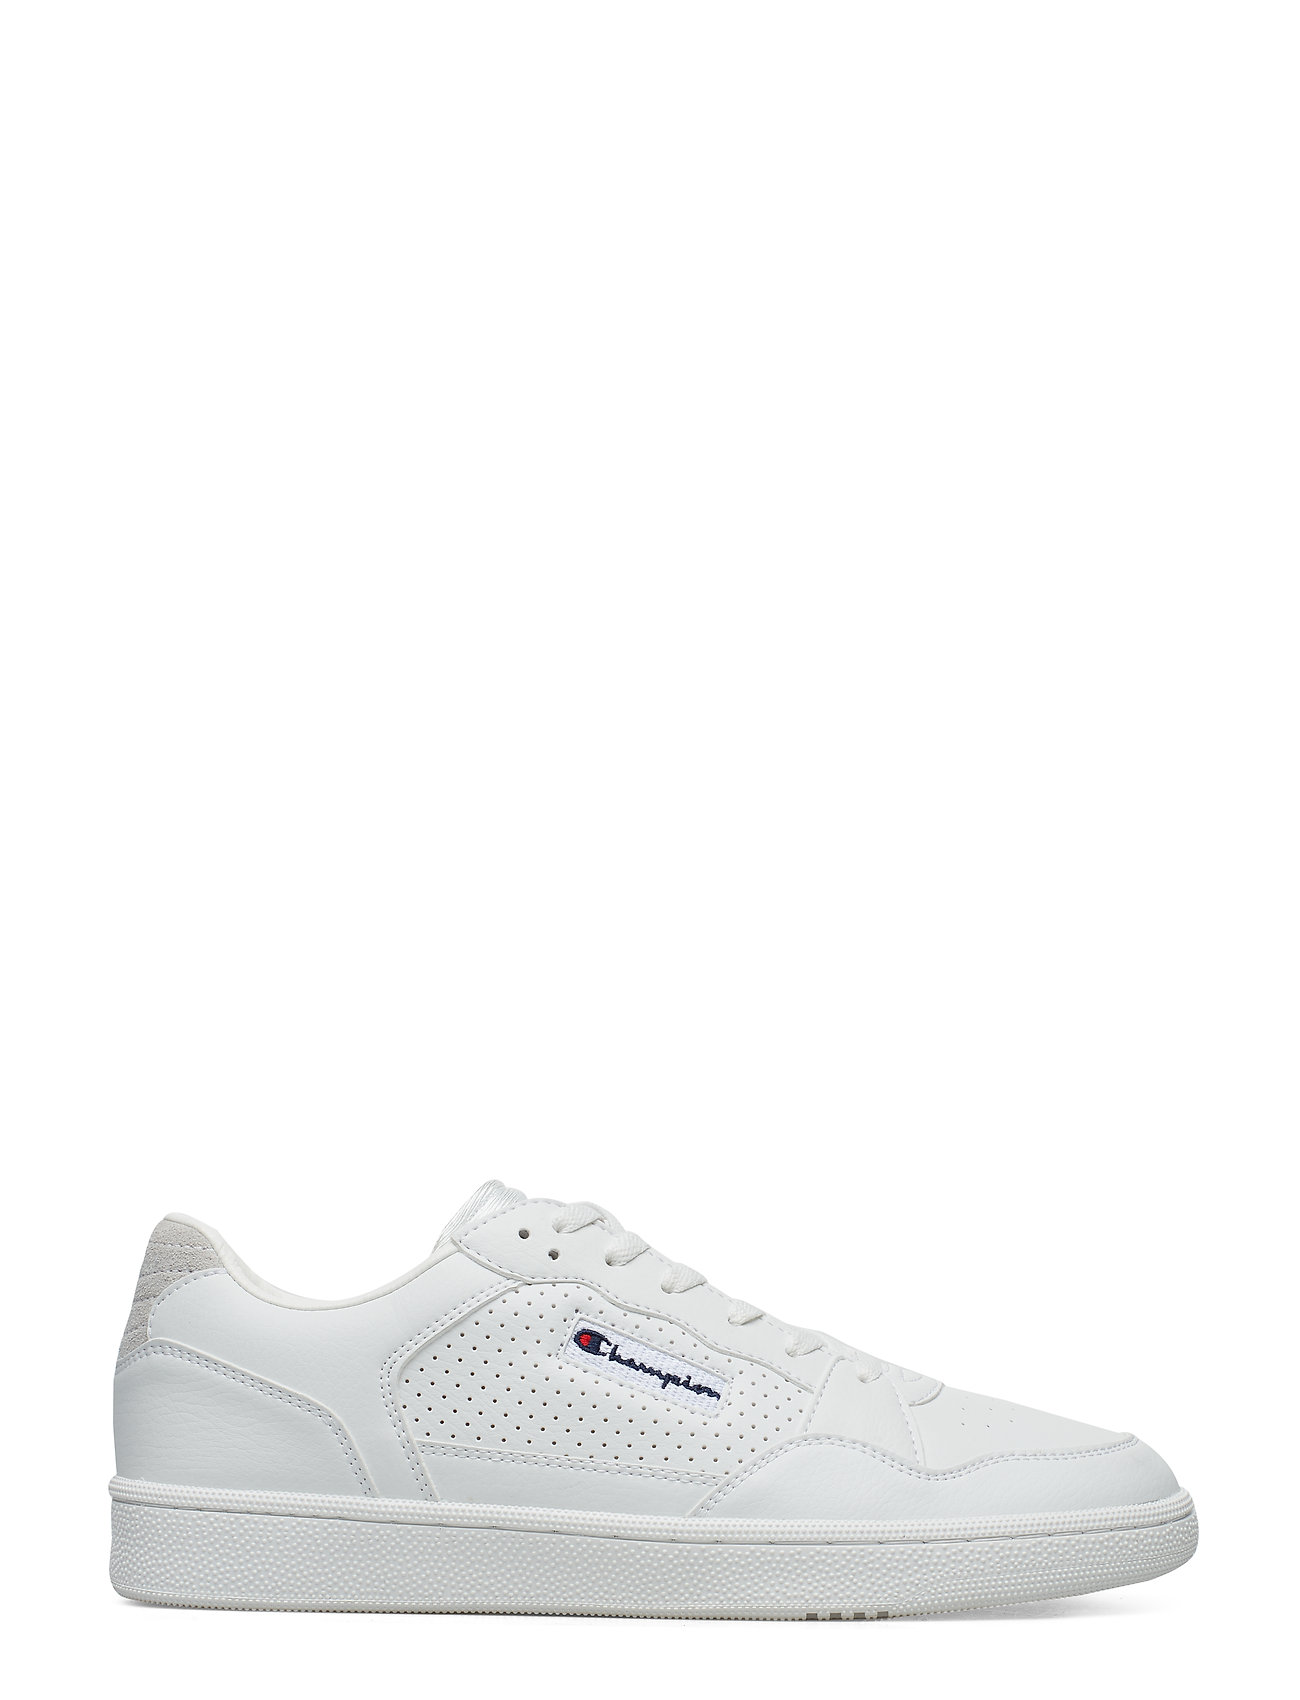 Low Cut Shoe Cleveland Low top Sneakers Hvid Champion